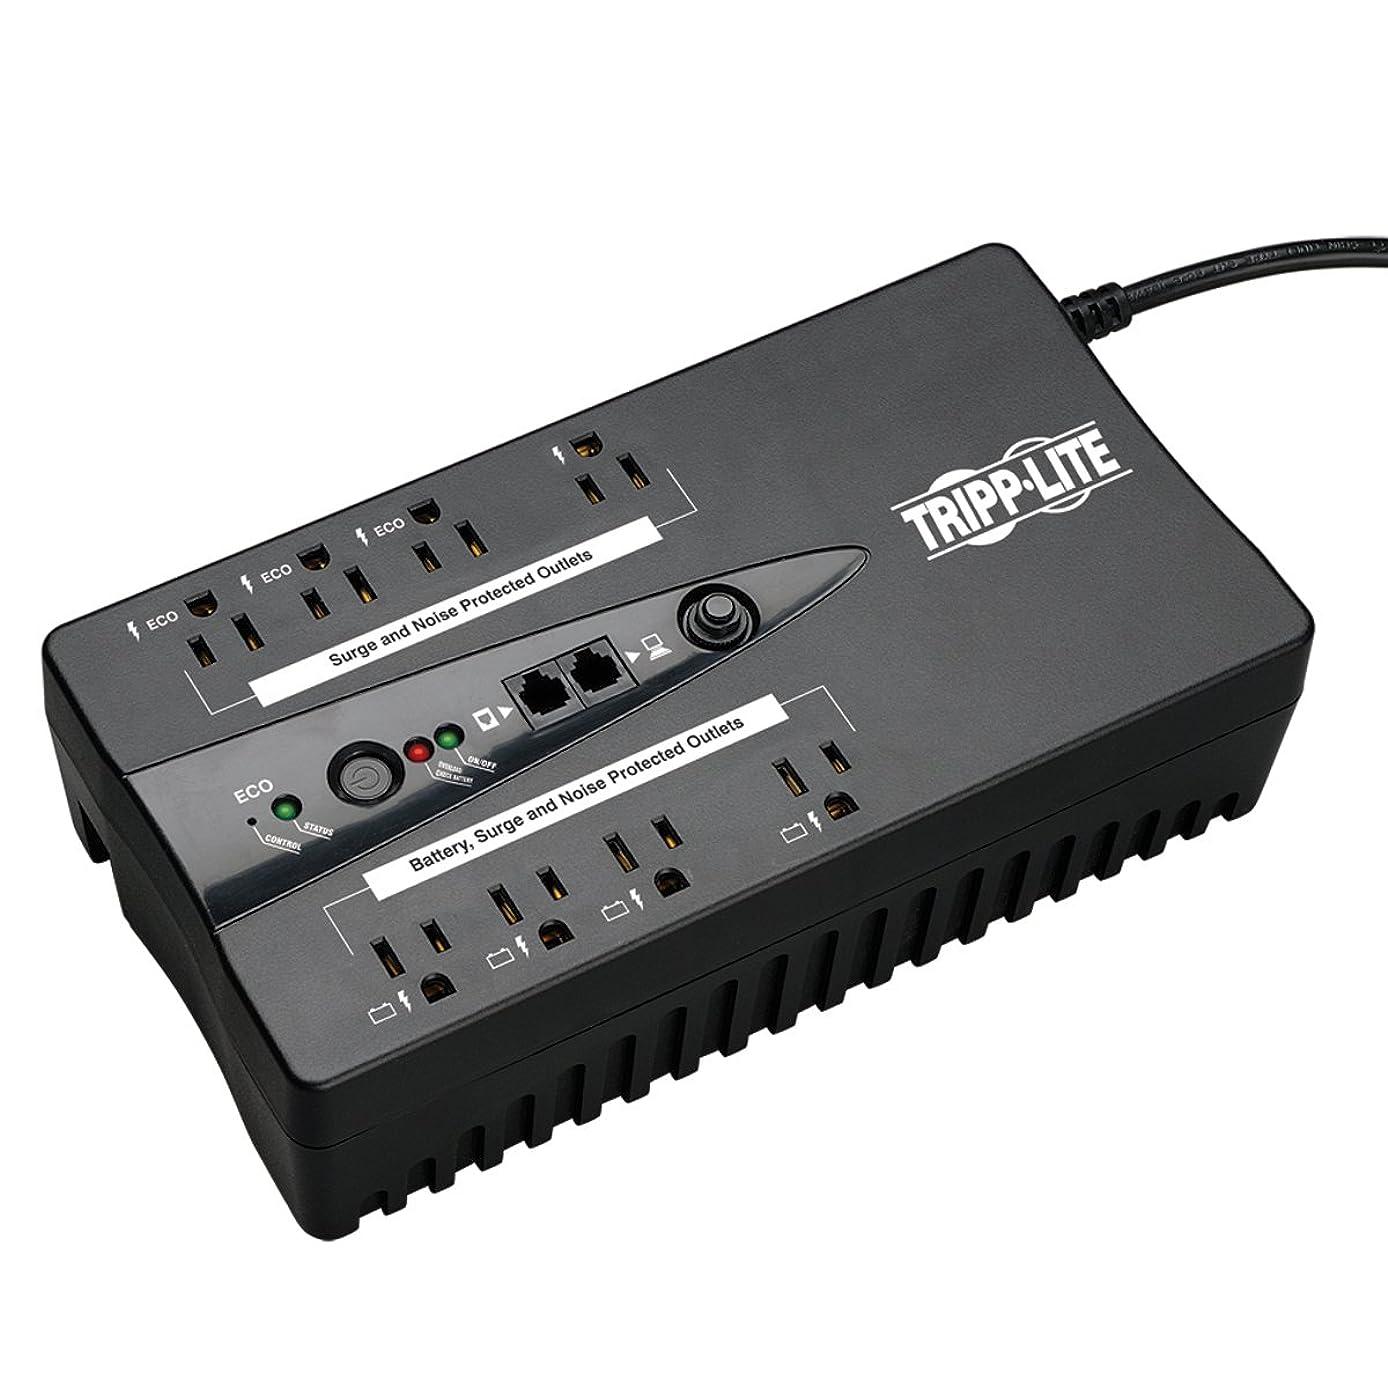 Tripp Lite 550VA UPS Battery Backup, 300W Eco Green, USB, RJ11, 8 Outlets (ECO550UPS)